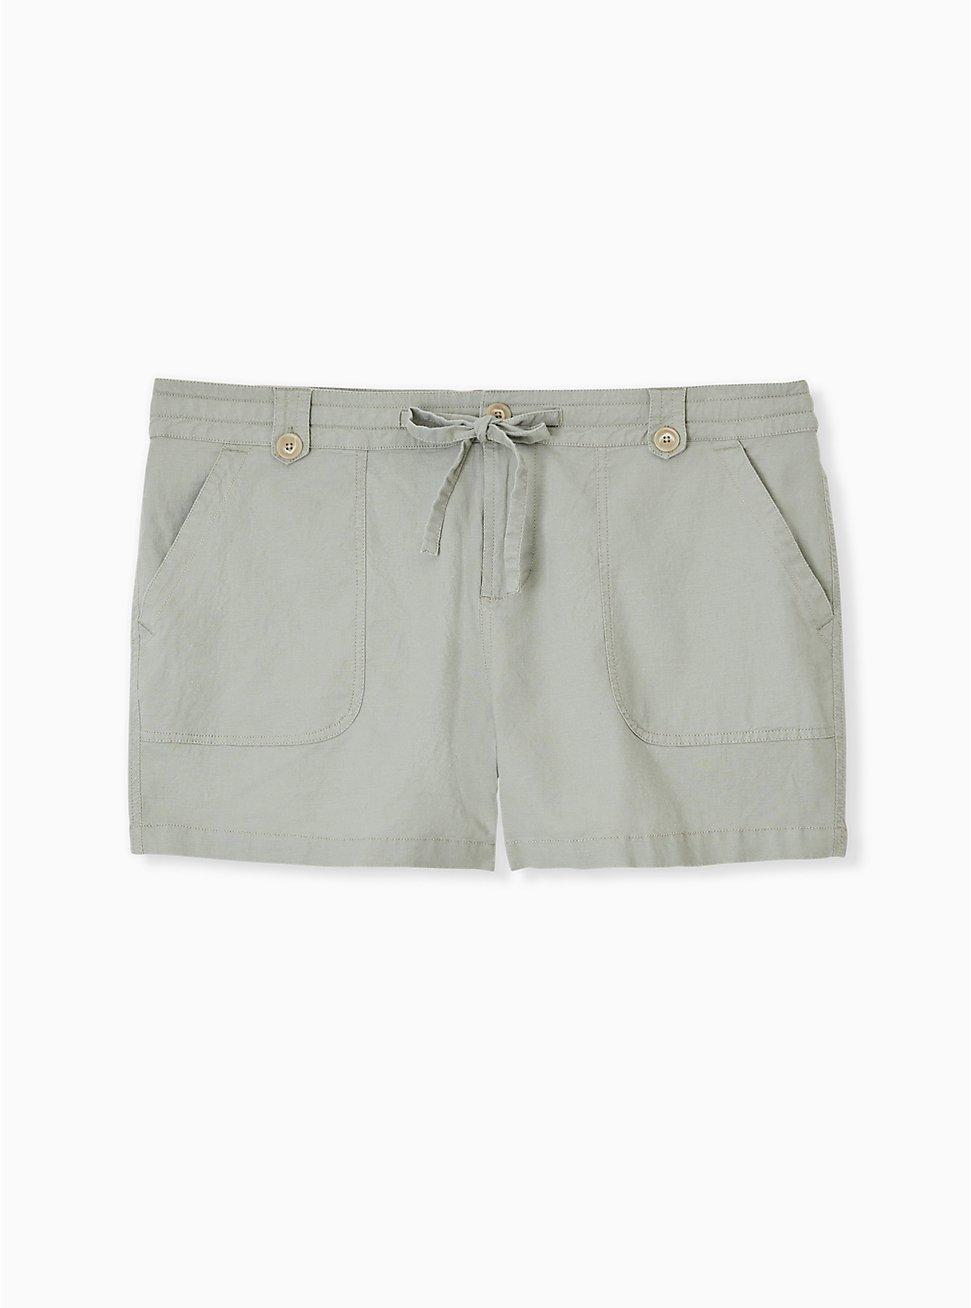 Drawstring Short Short - Linen Sage Green , SEAGRASS, hi-res